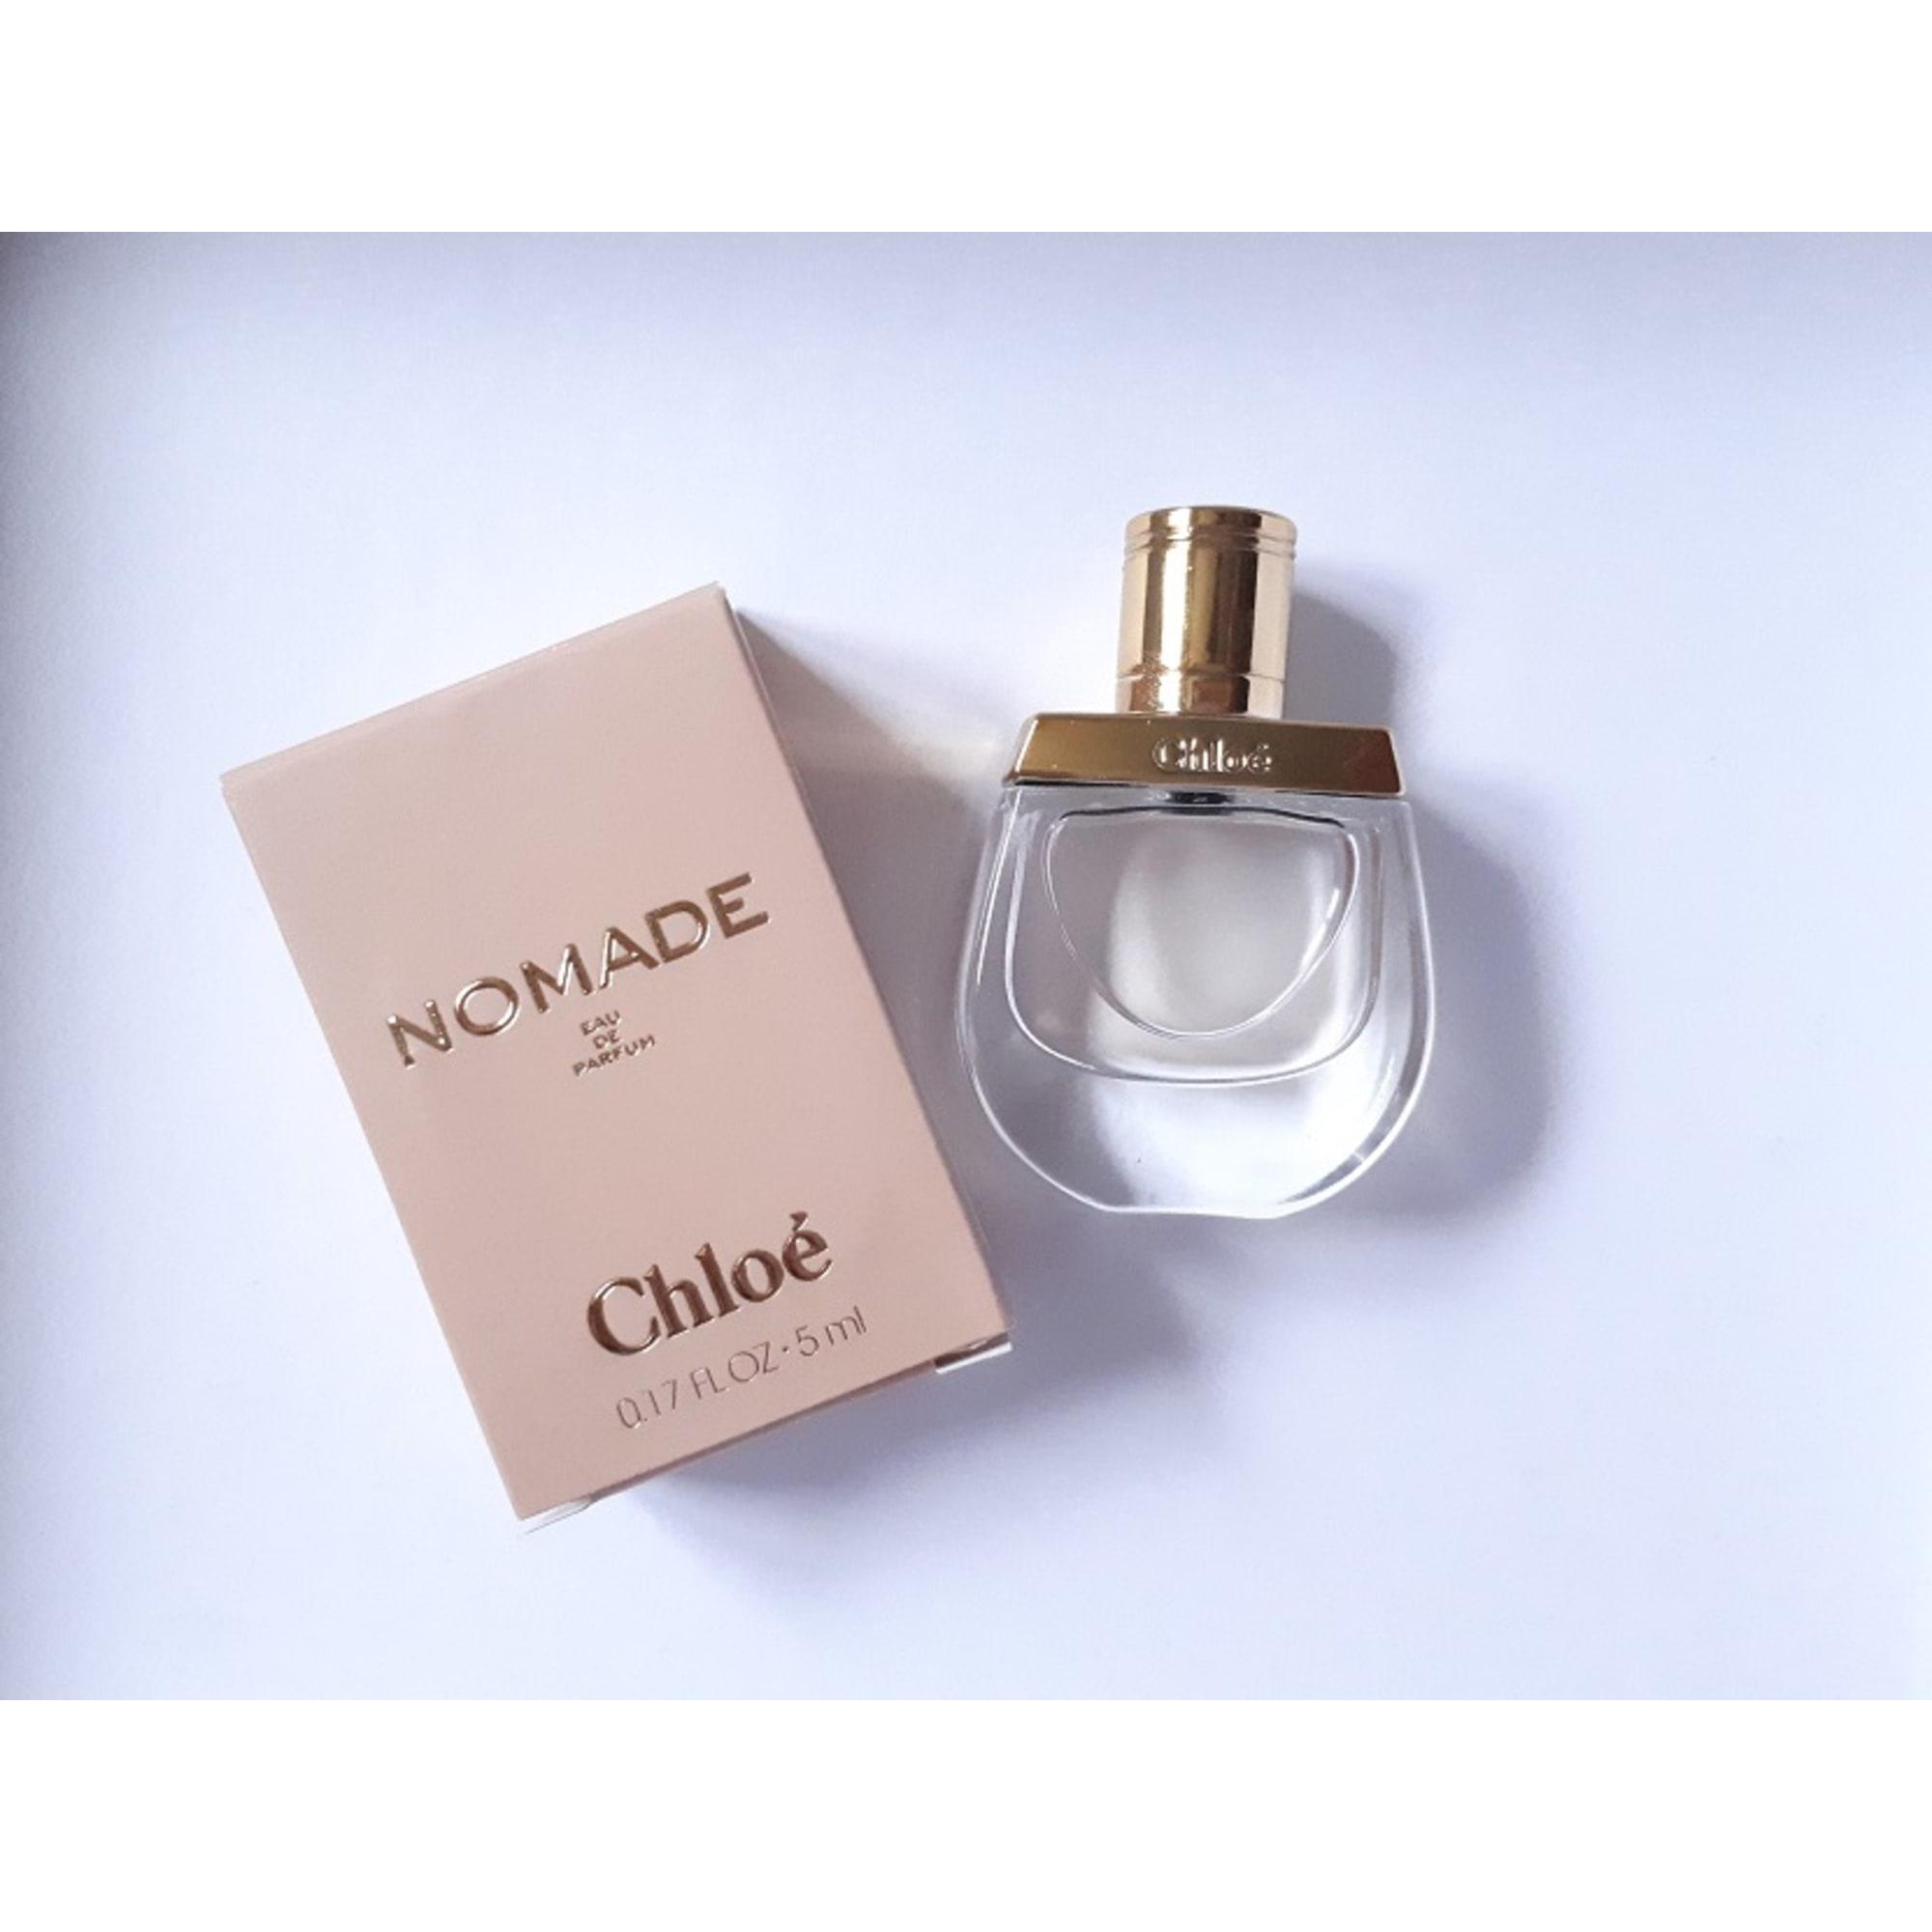 Miniature Miniature Miniature Parfum Parfum Miniature Parfum Parfum Miniature rshQtCd